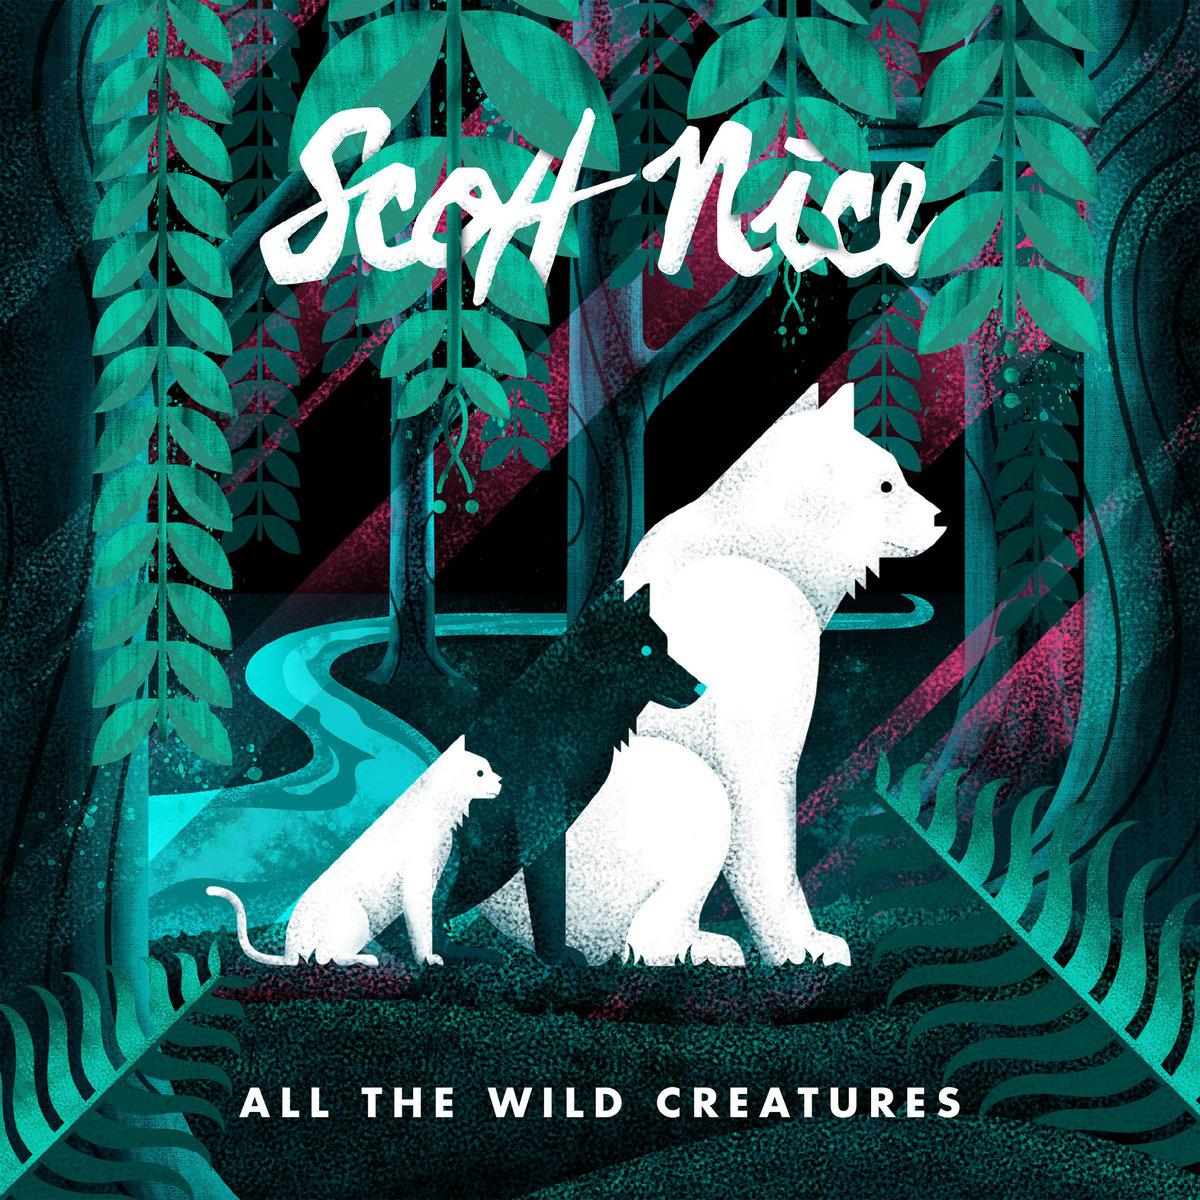 Scott Nice - All The Wild Creatures